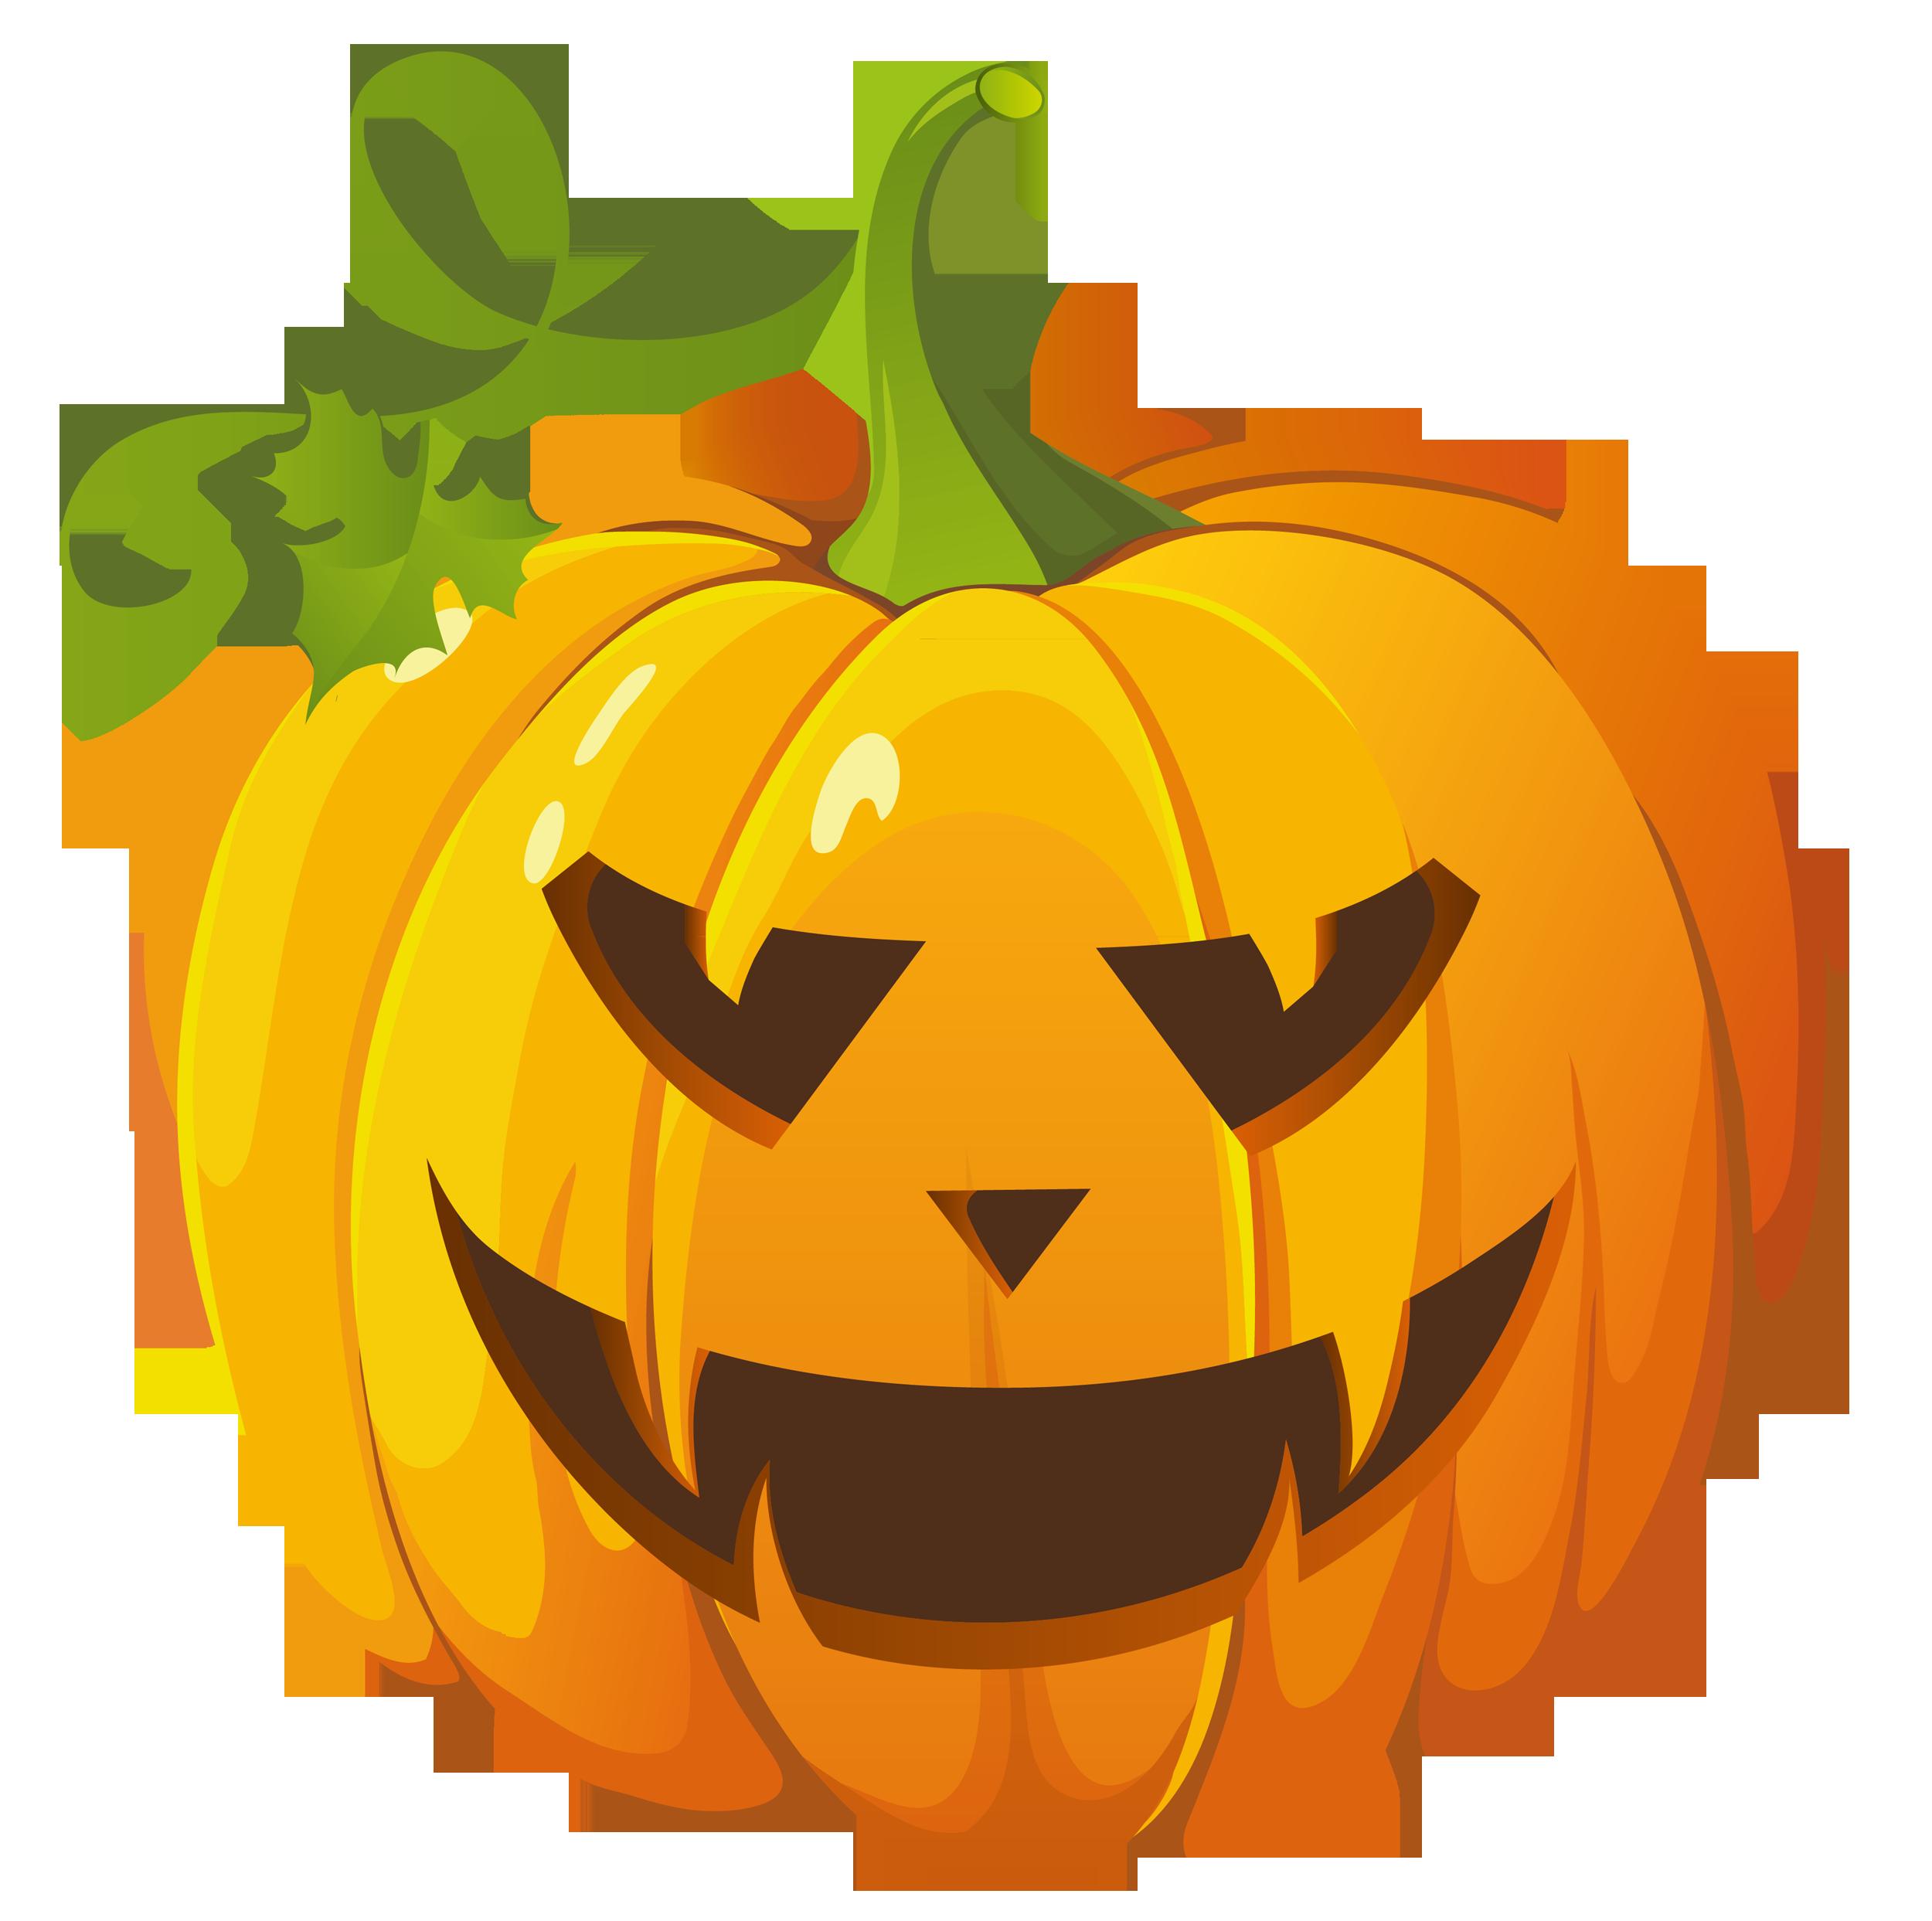 Clip art pumpkins clipart ima - Pumpkins Clipart